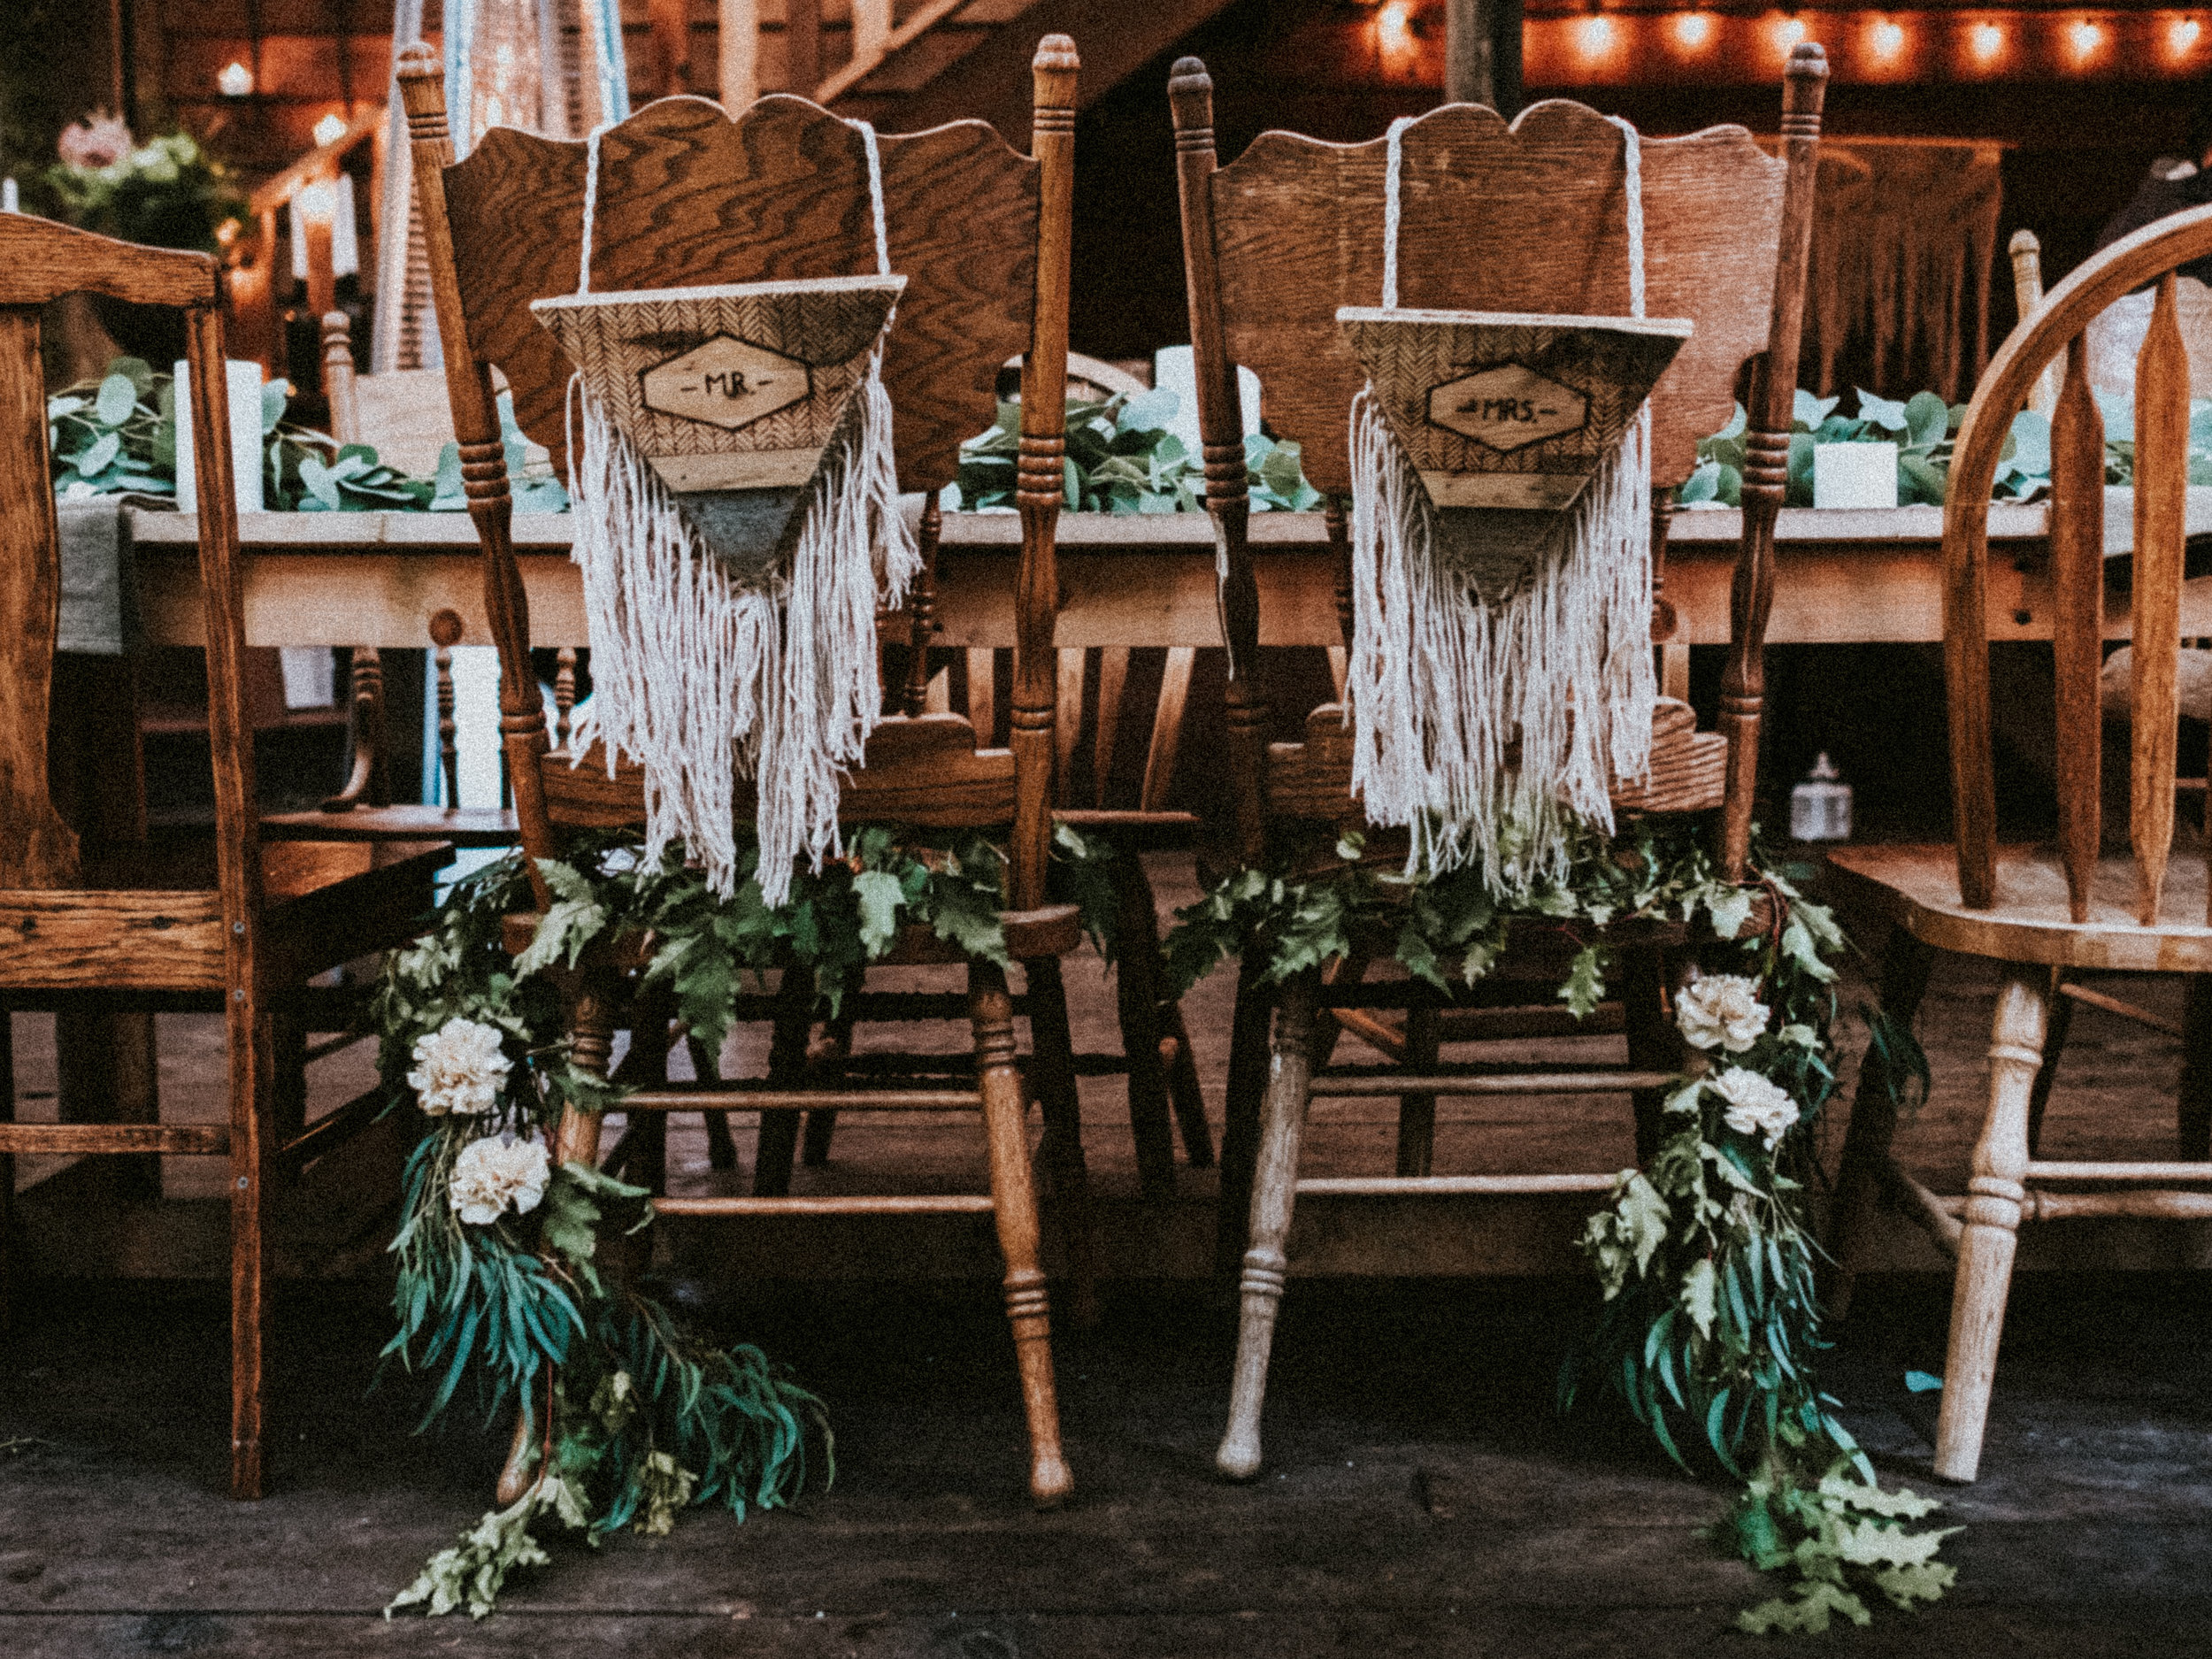 KRISTIAN AND CALEB WEDDING - GIRDWOOD, ALASKA